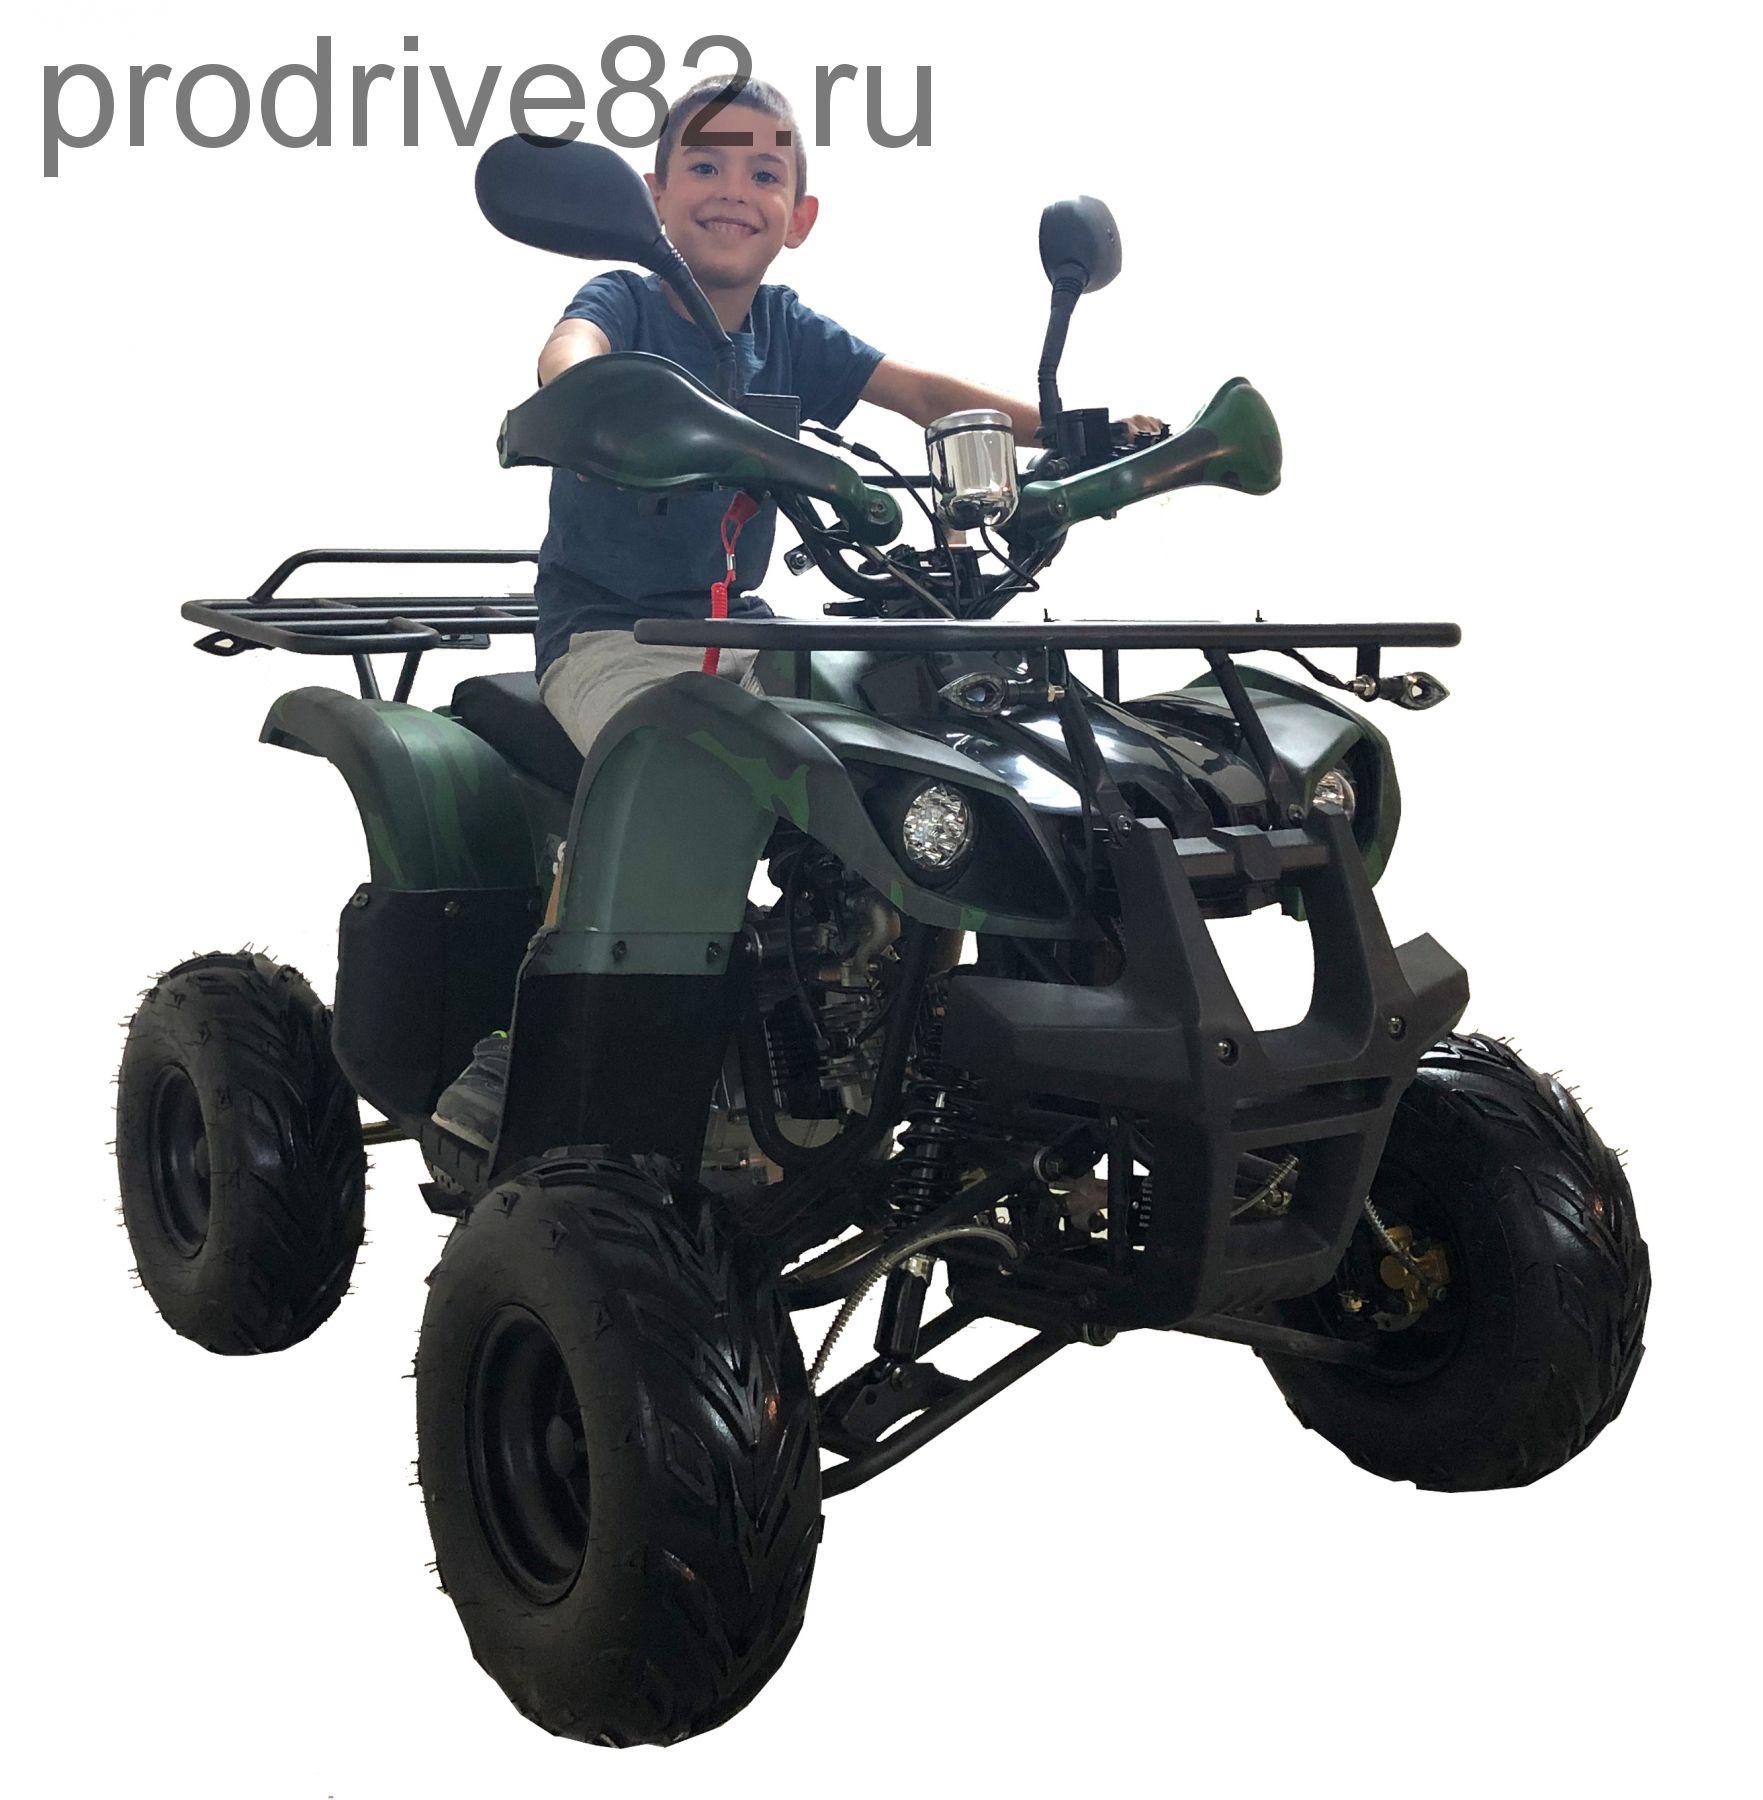 MOWGLI Simple 7 125 сс Квадроцикл бензиновый